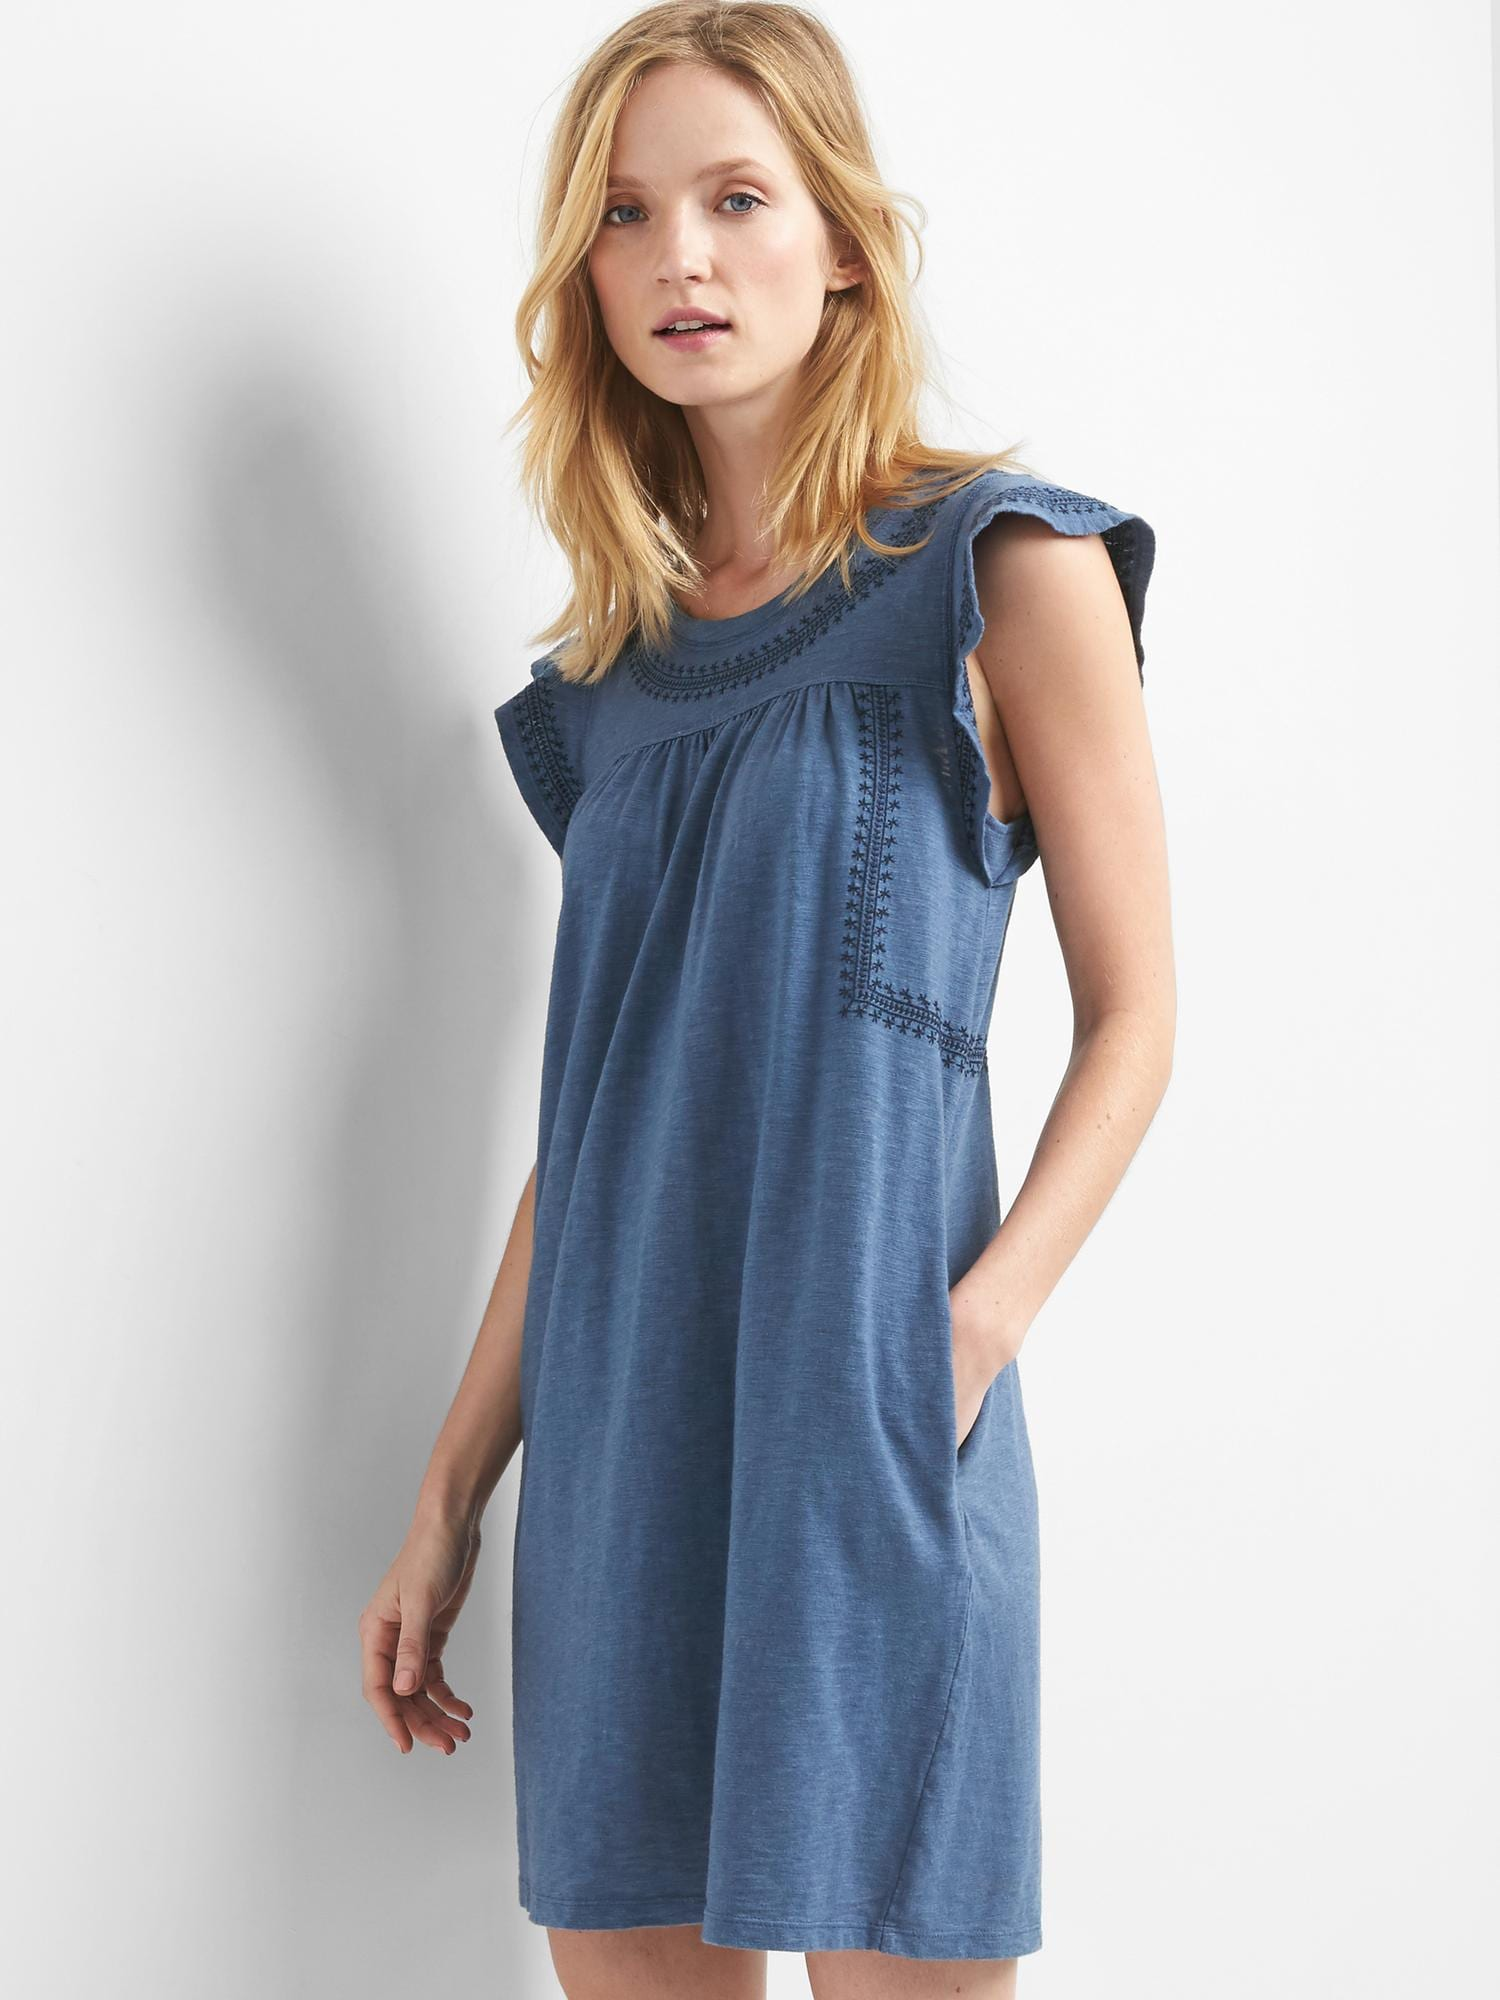 Embroidered slub jersey swing dress | Gap